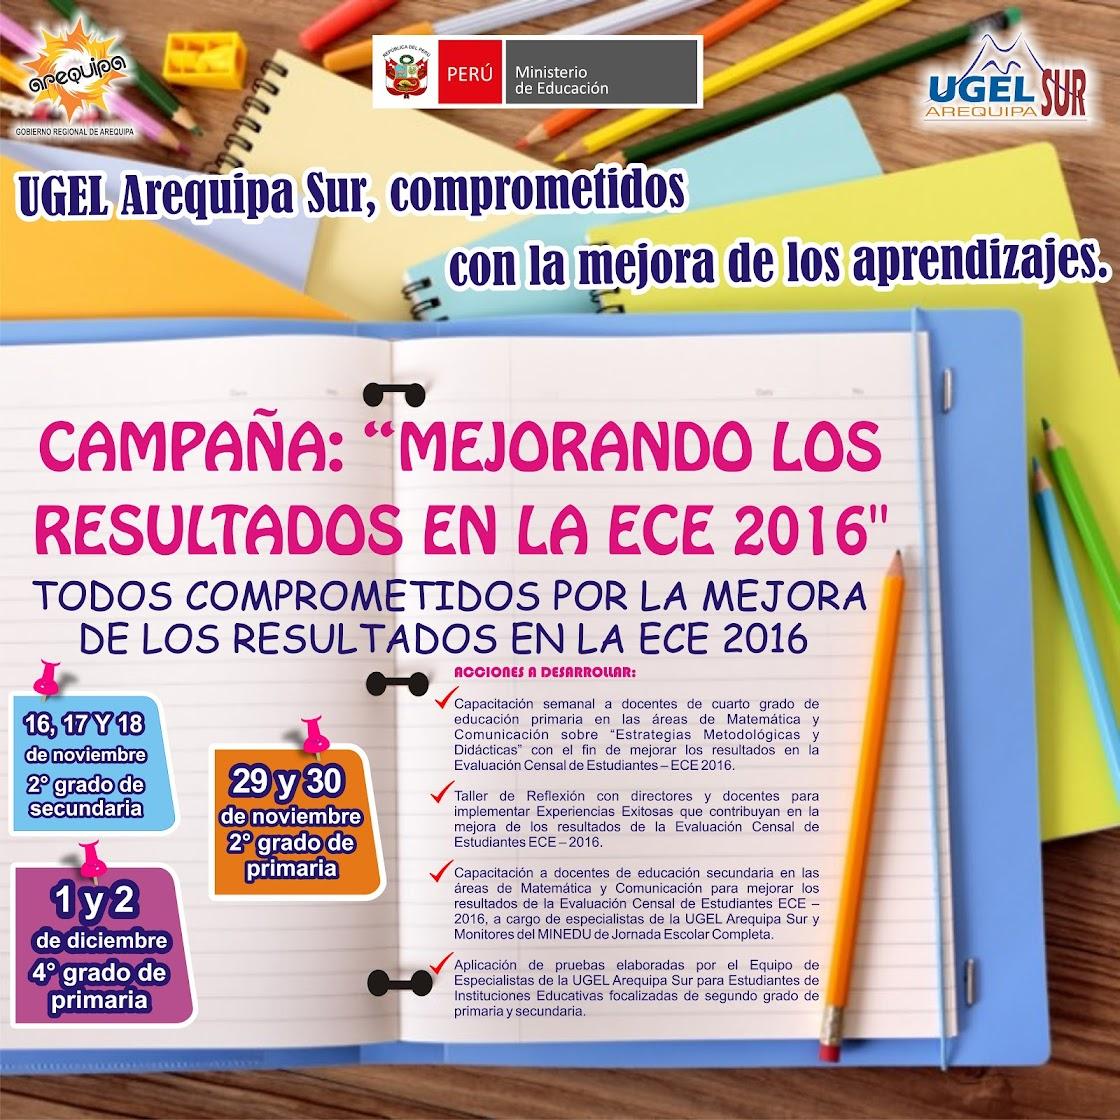 CAMPAÑA ECE 2016